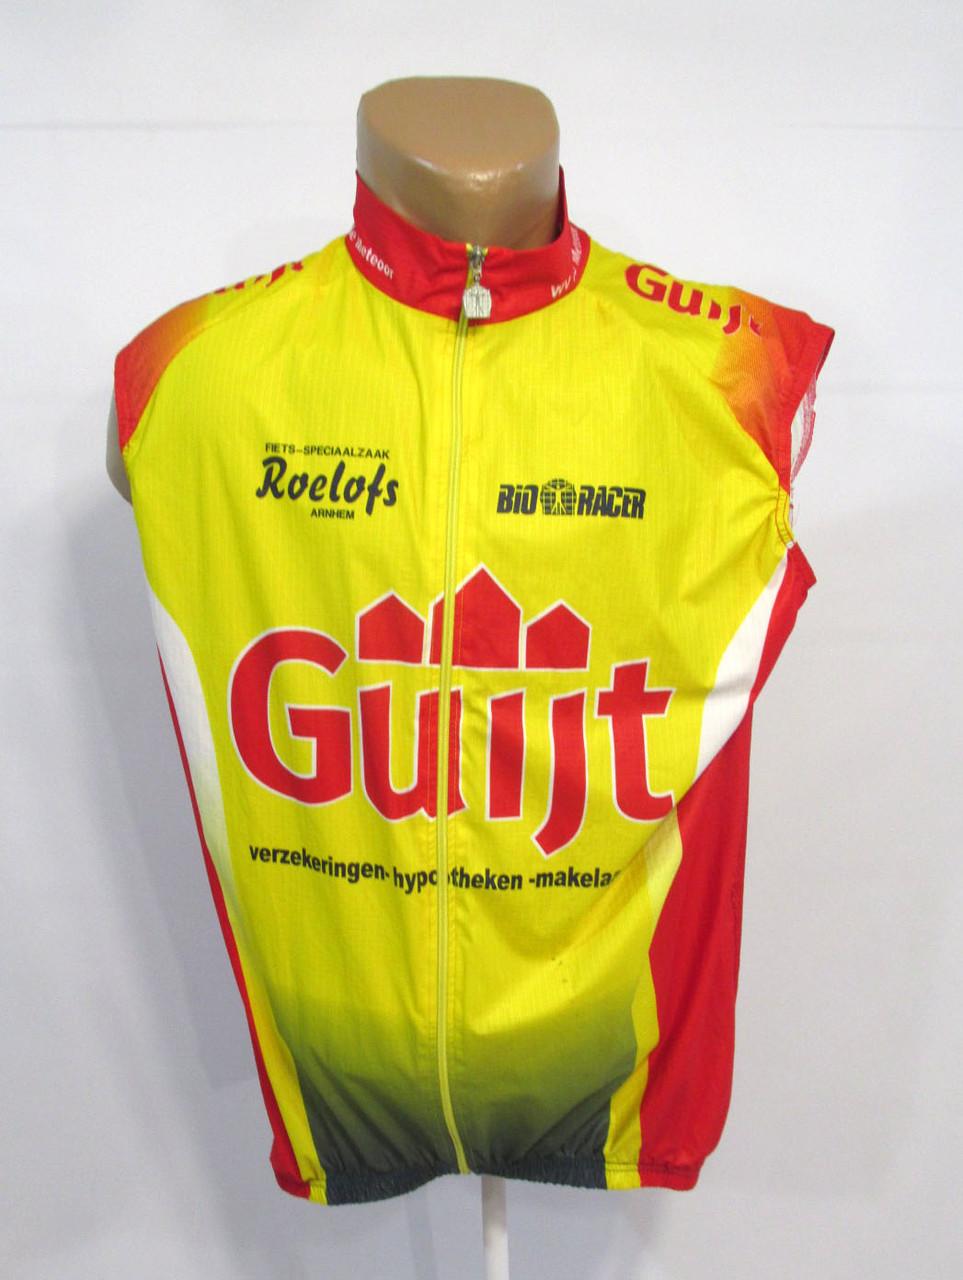 Вело футболка GUIT 6 (L), Есть загрязнения (на фото), Уценка!